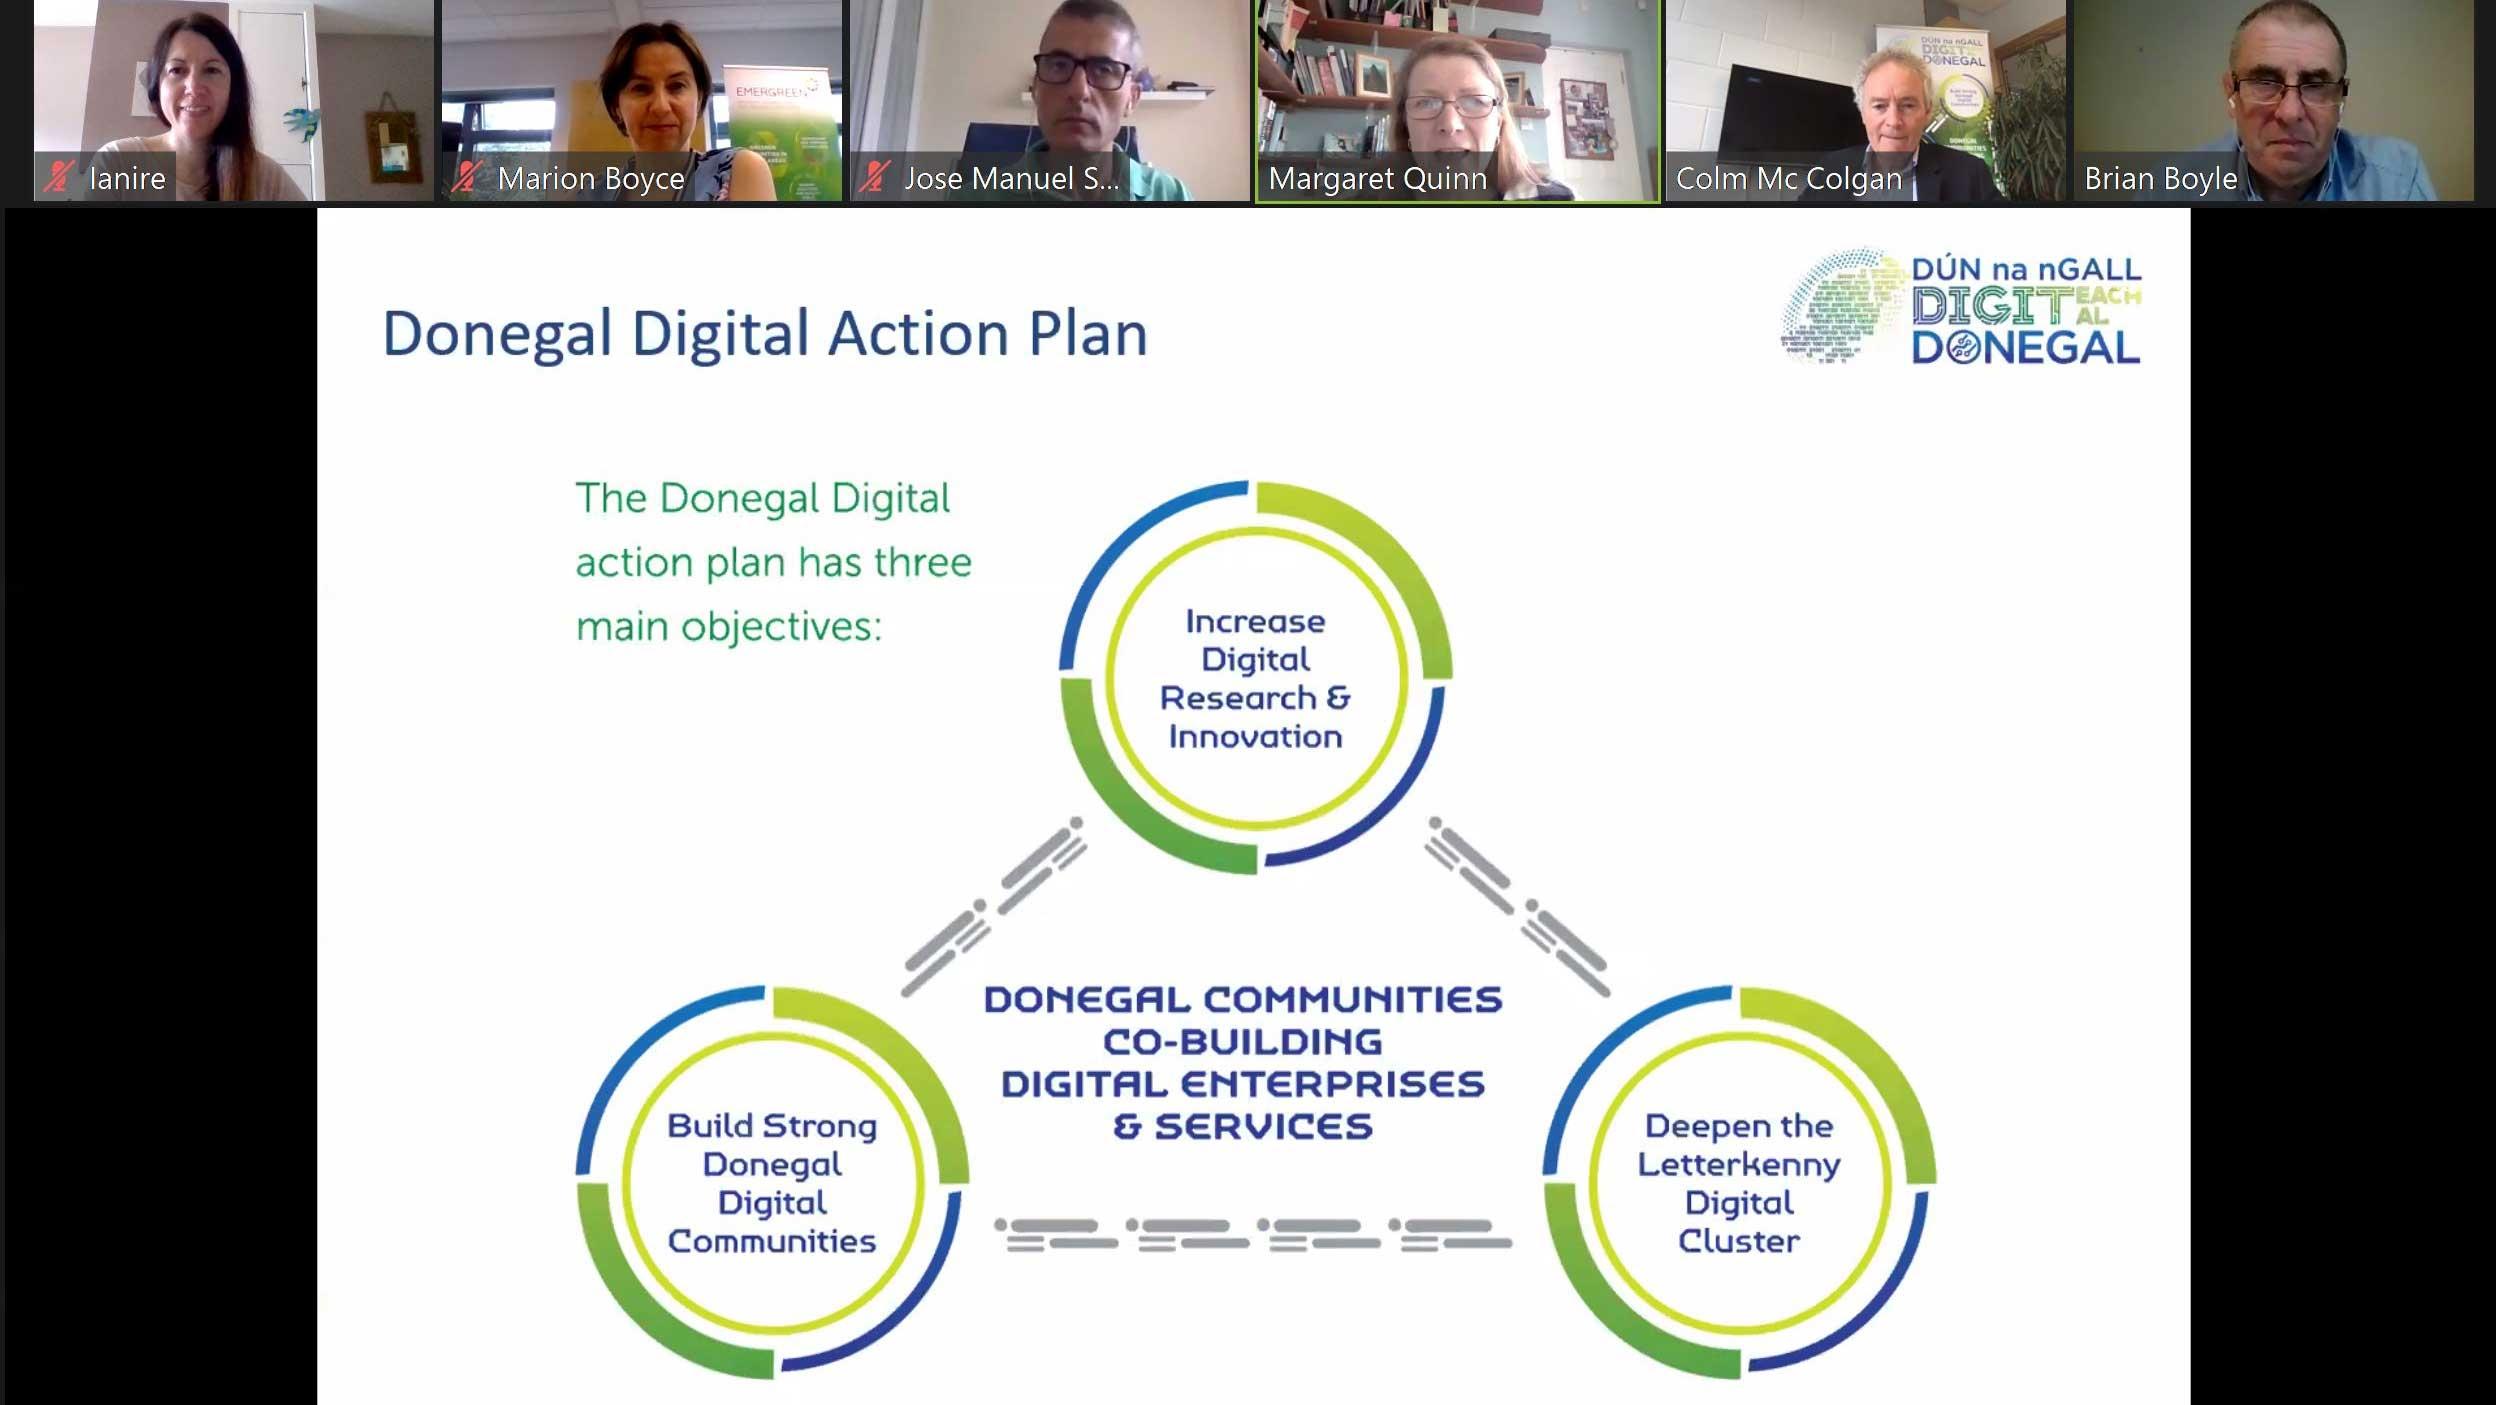 Donegal Digital Action Plan Stakeholder meeting